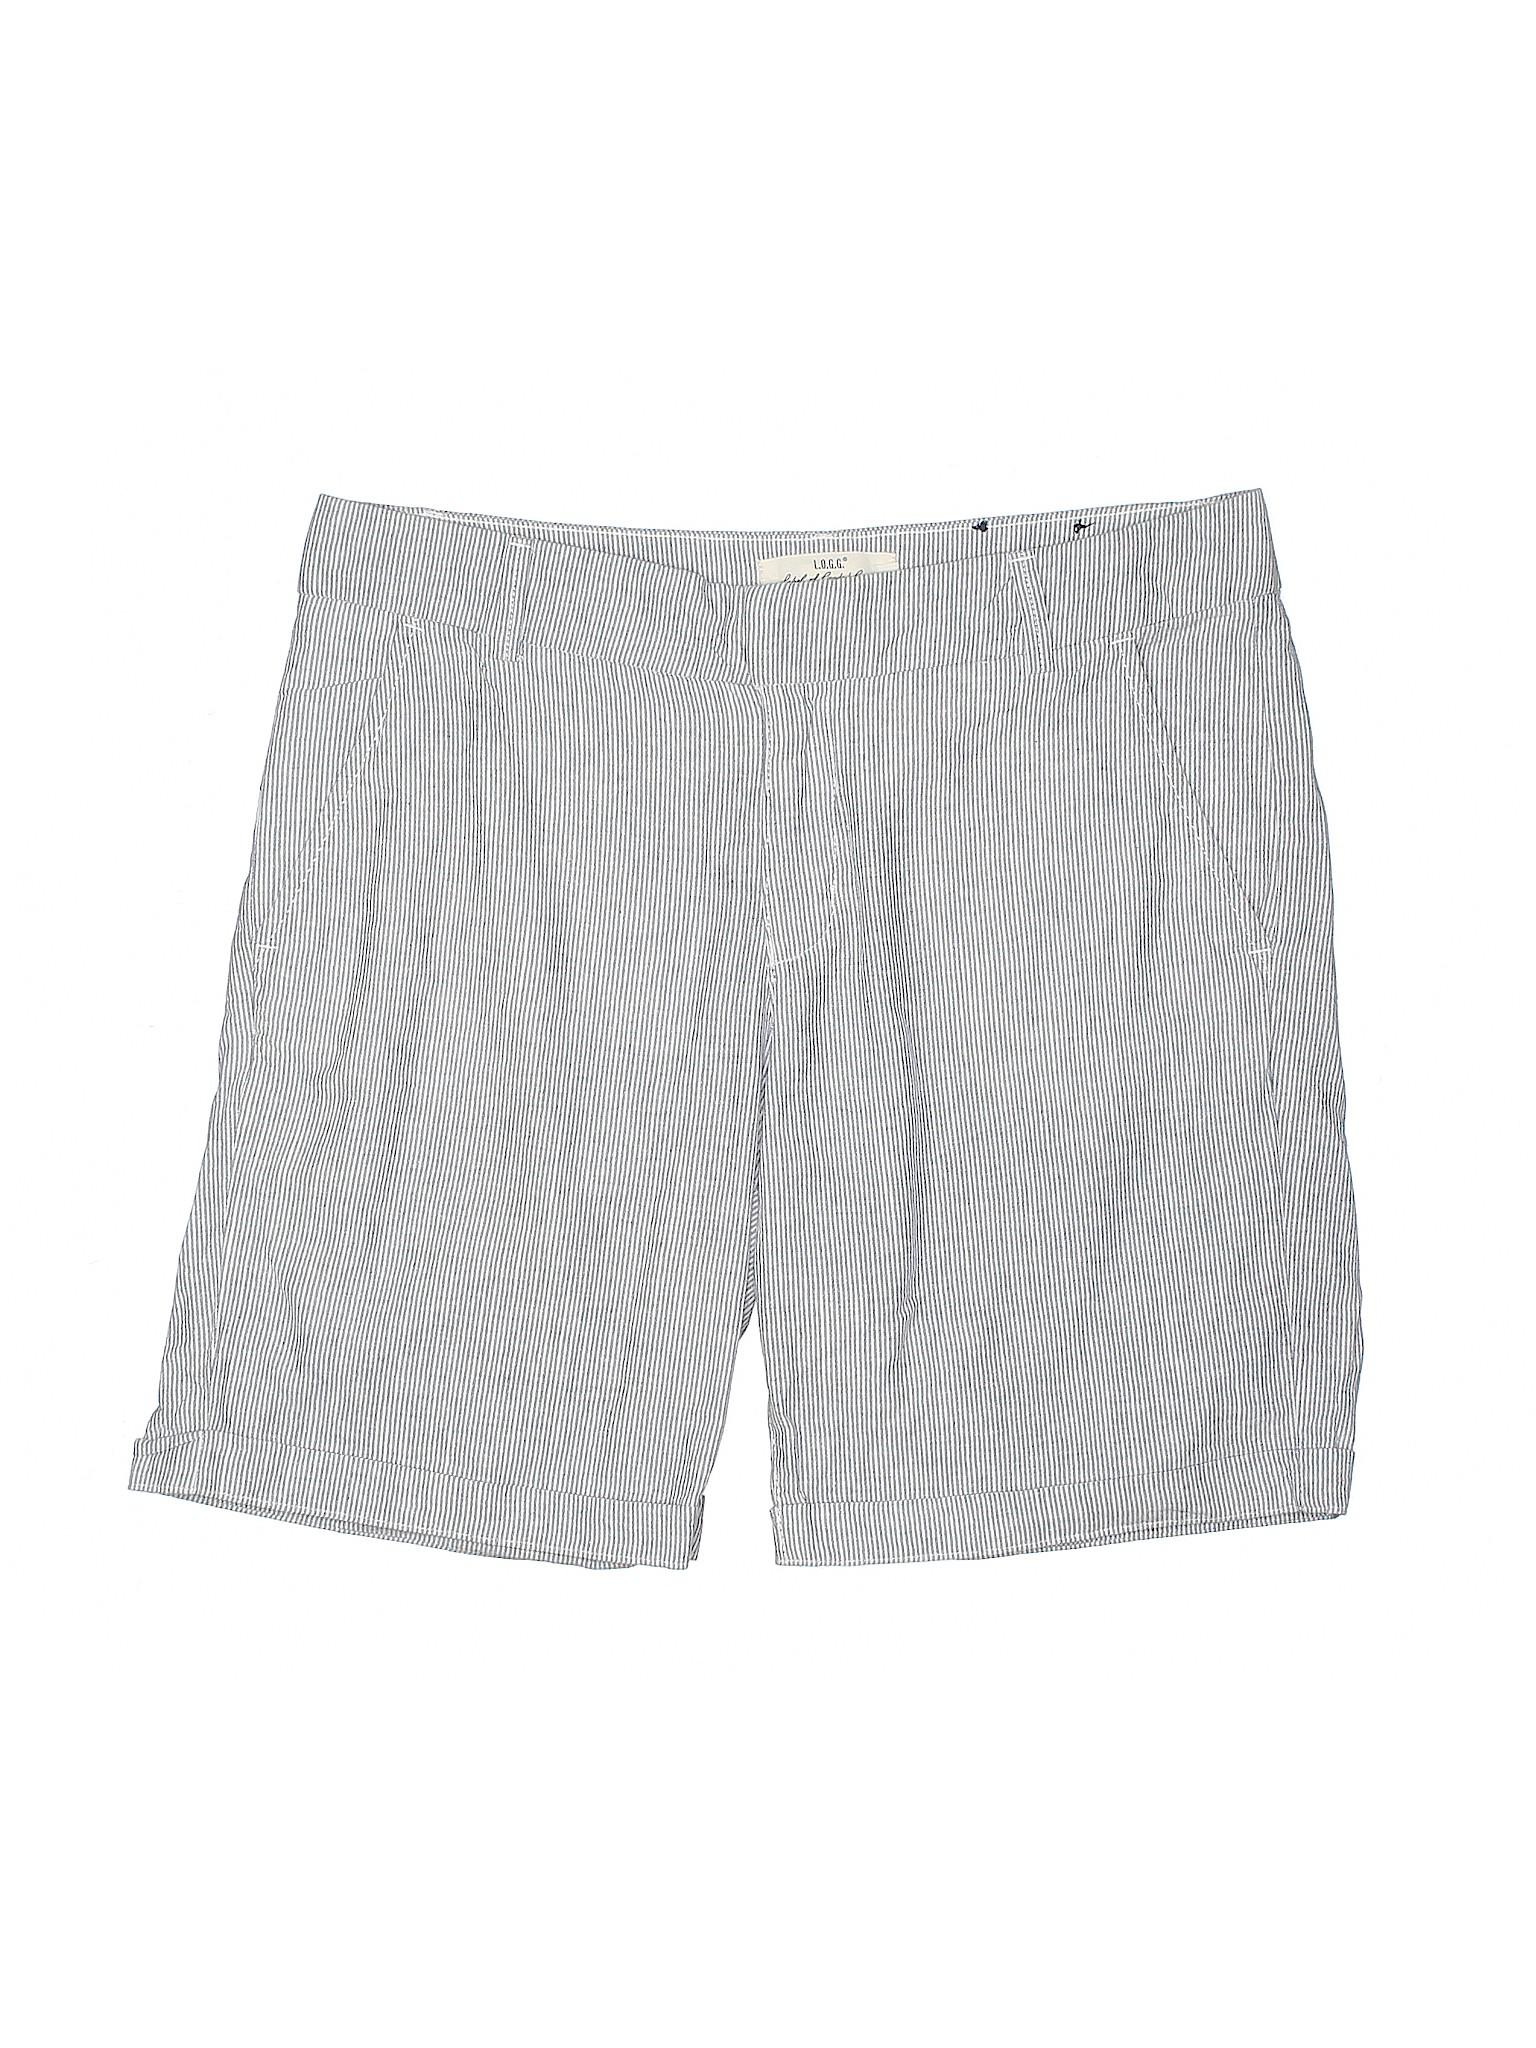 H amp;M winter G L Leisure O G Shorts TP5qA